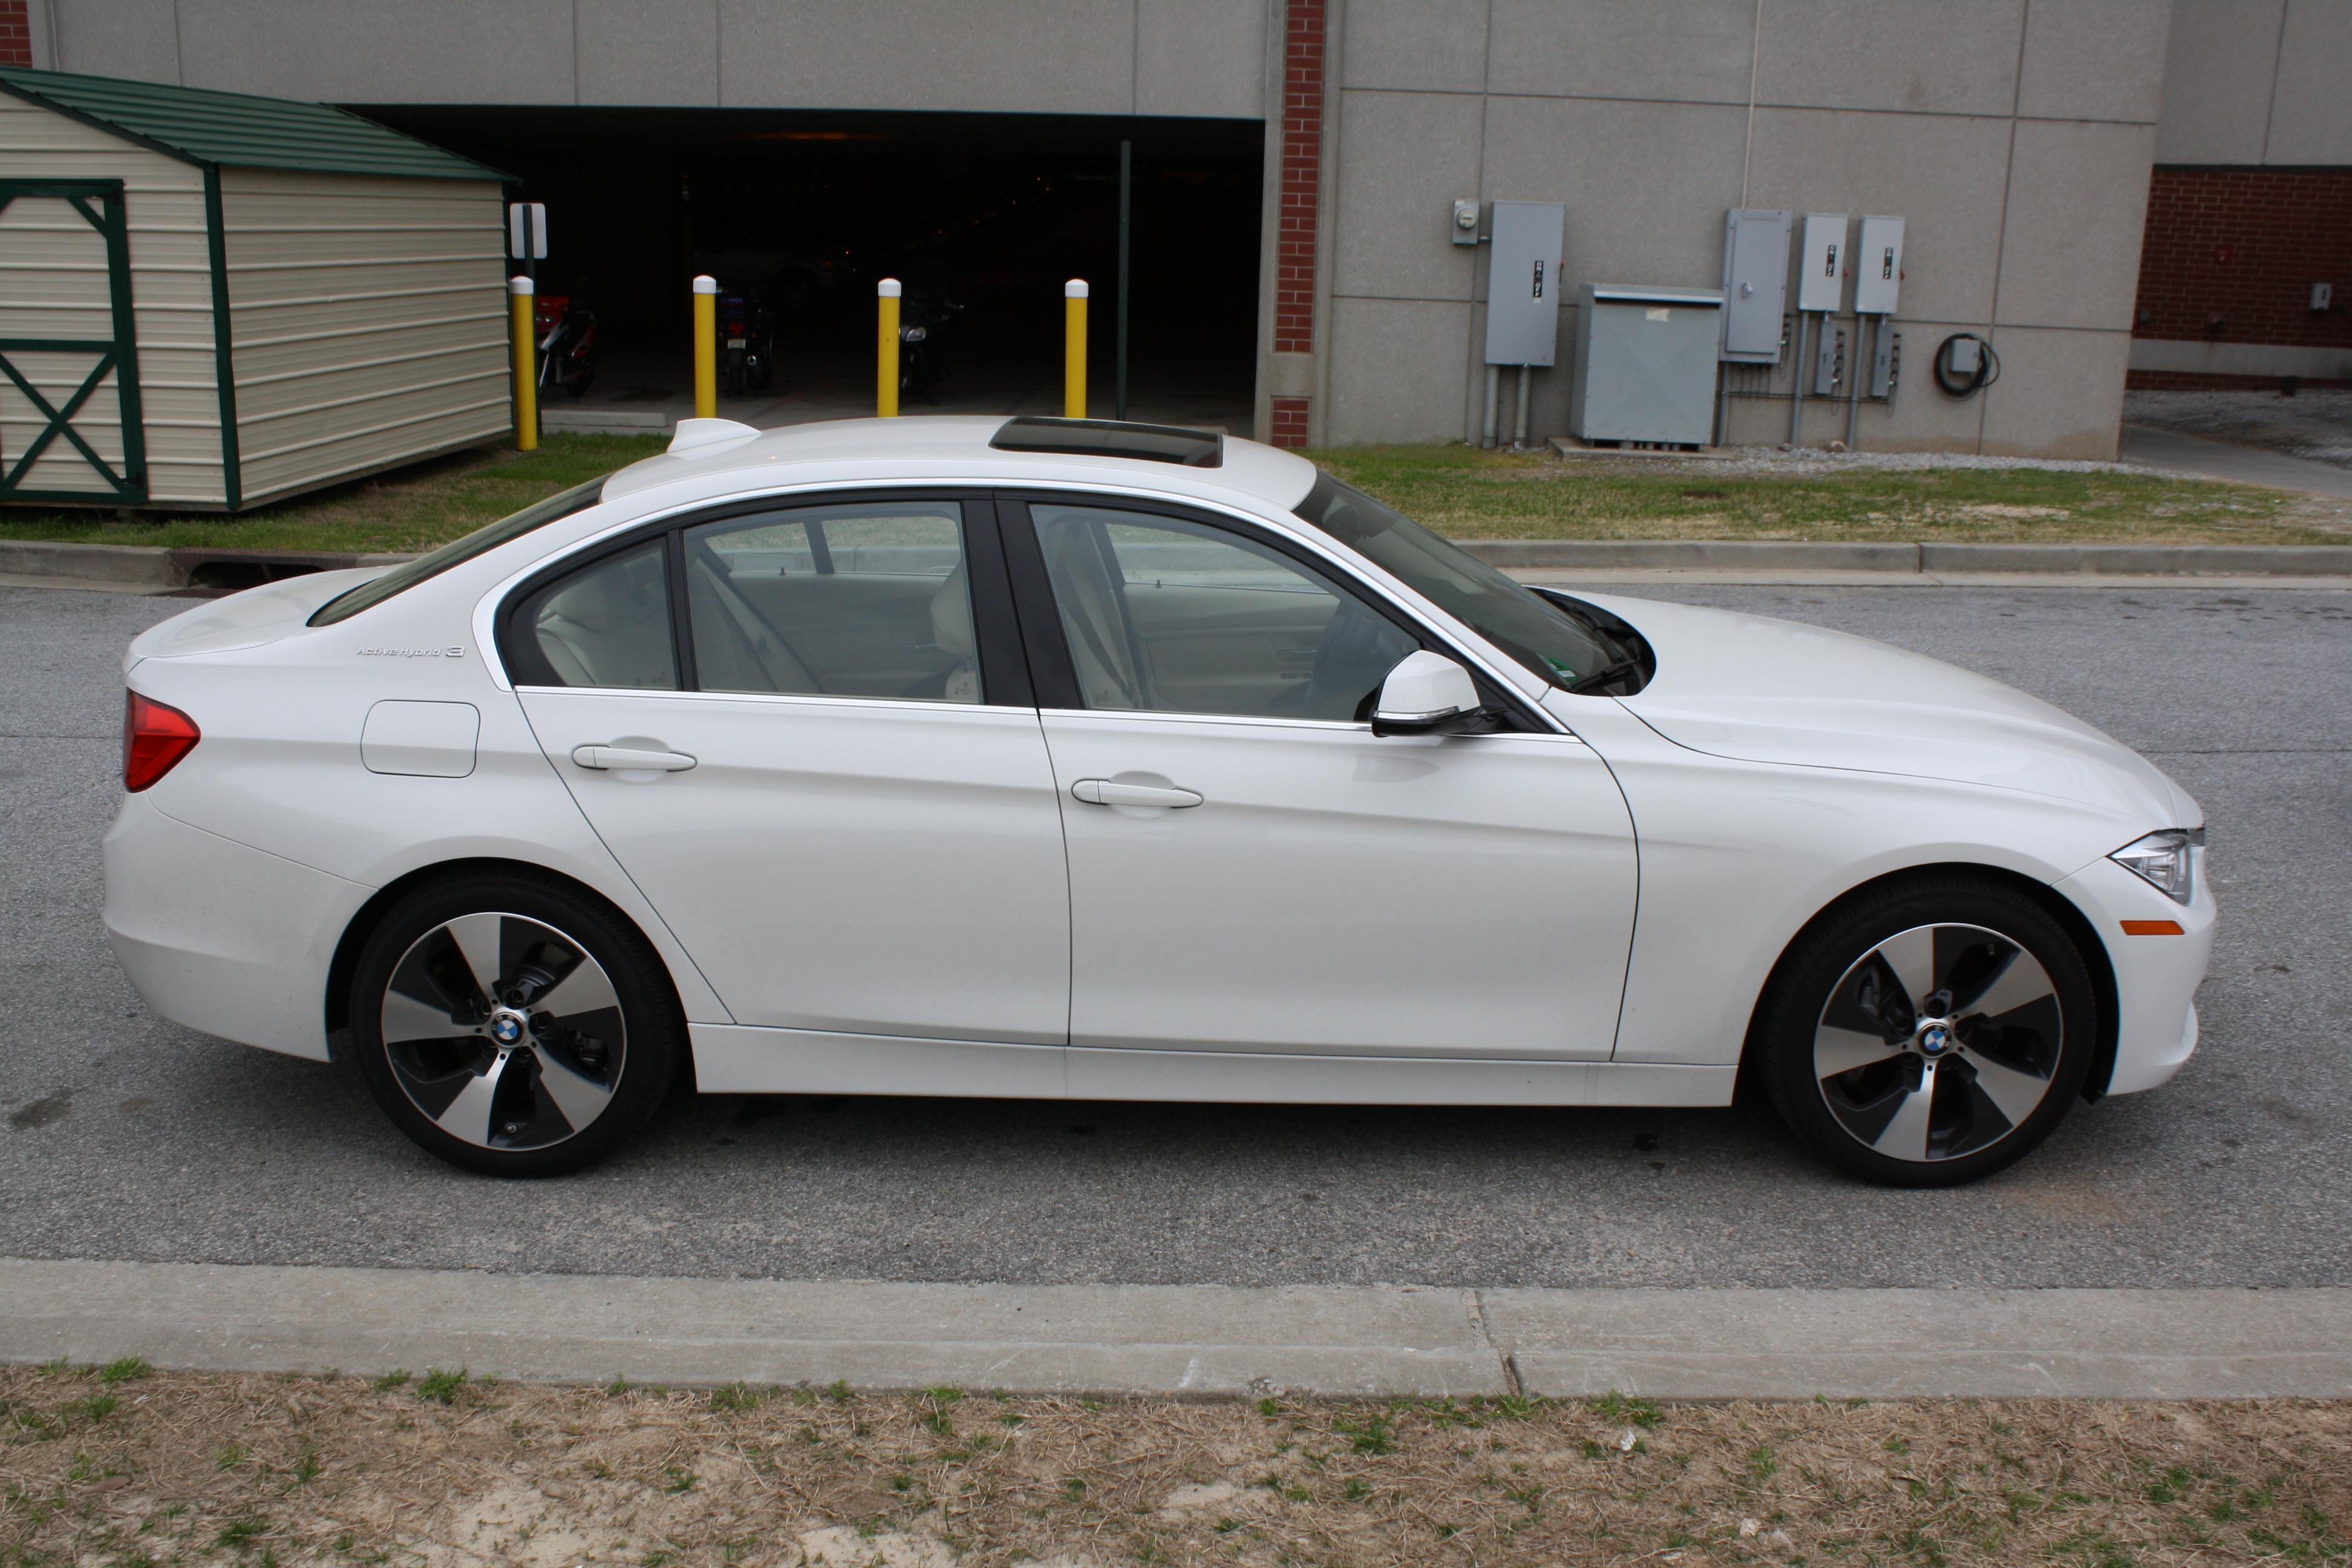 2013 BMW 335i Hybrid   Diminished Value Car Appraisal